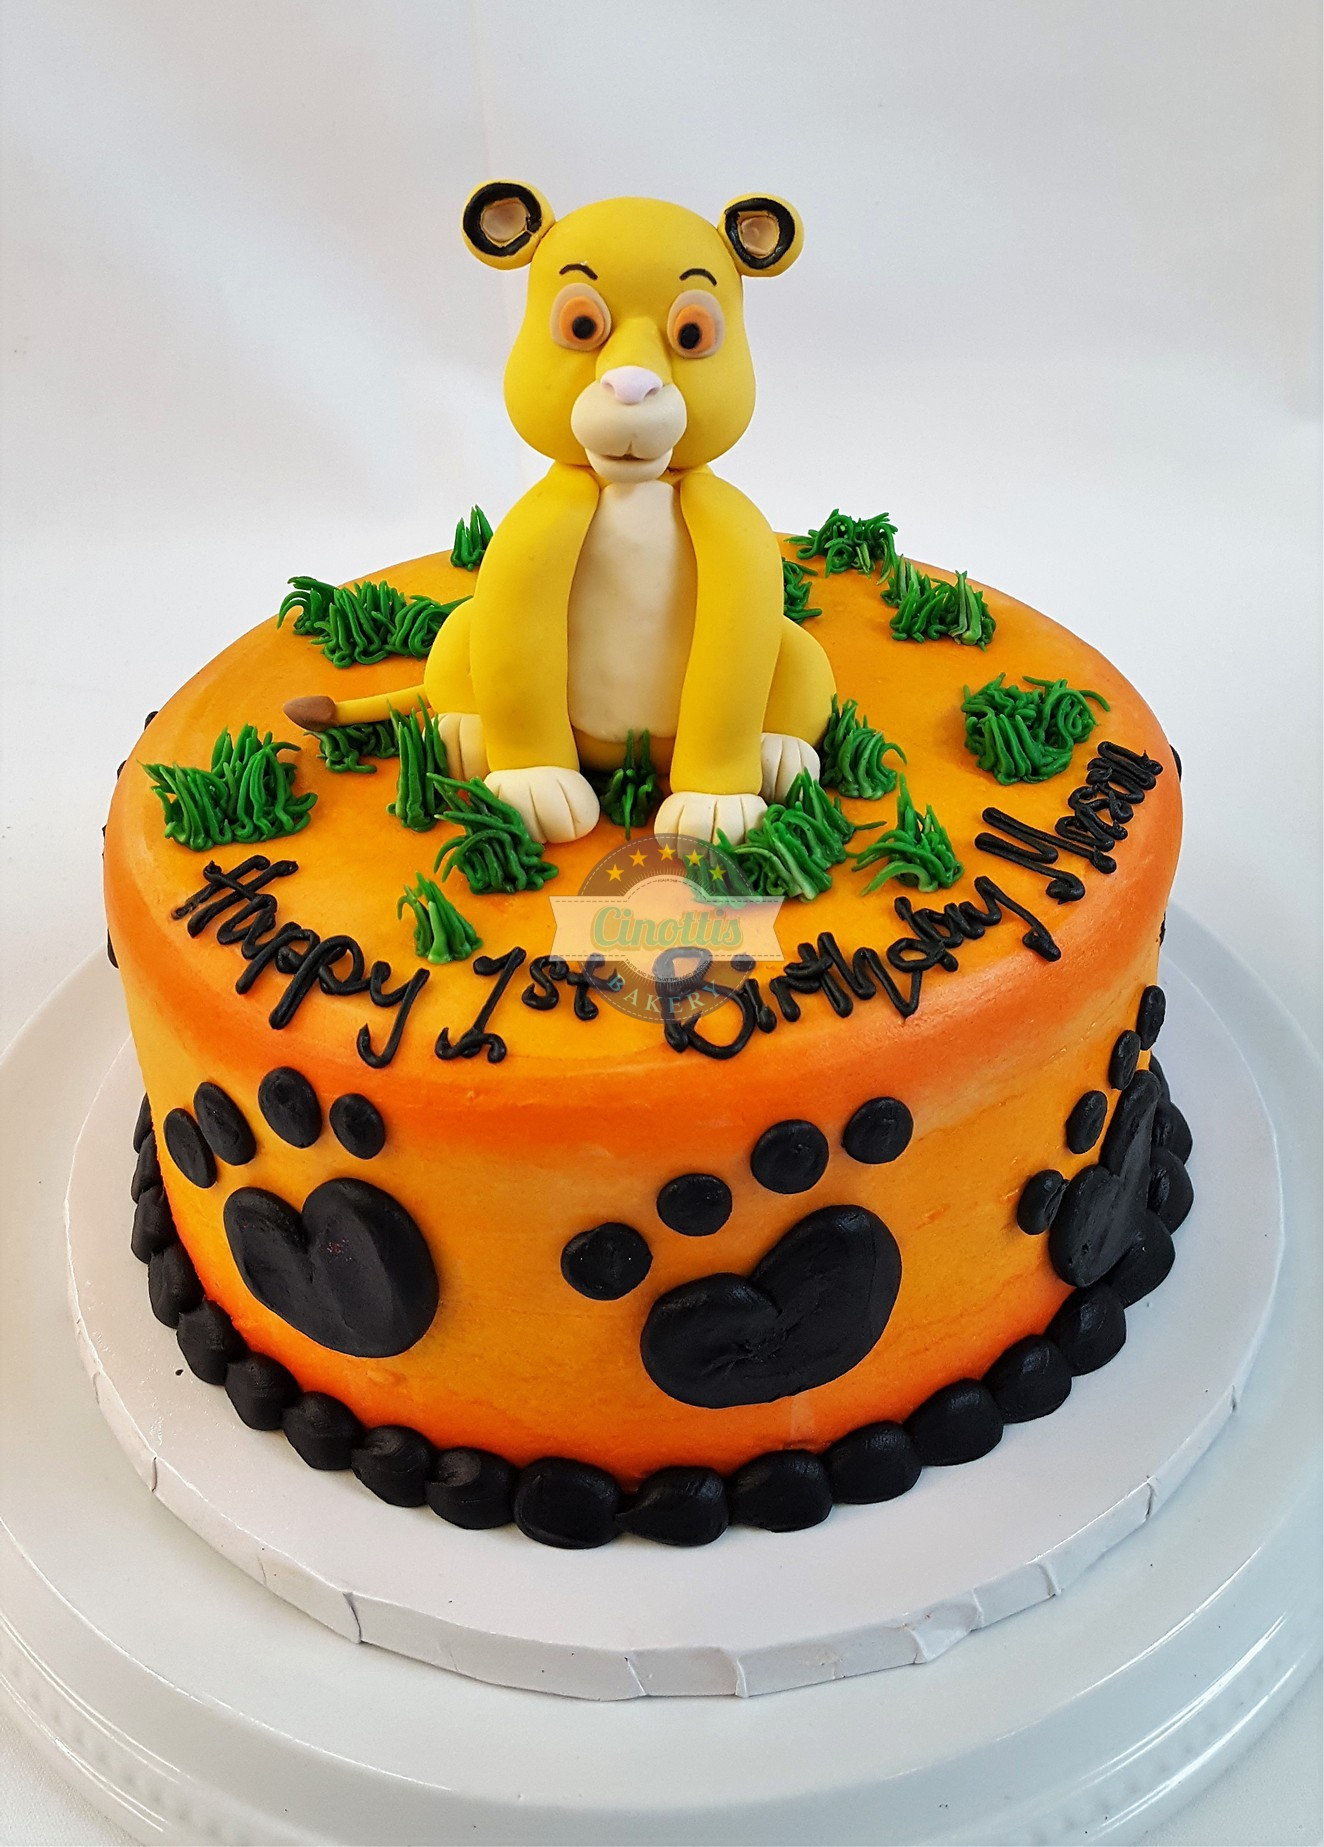 Awe Inspiring Cakes And Cupcakes Cinottis Bakery Personalised Birthday Cards Paralily Jamesorg